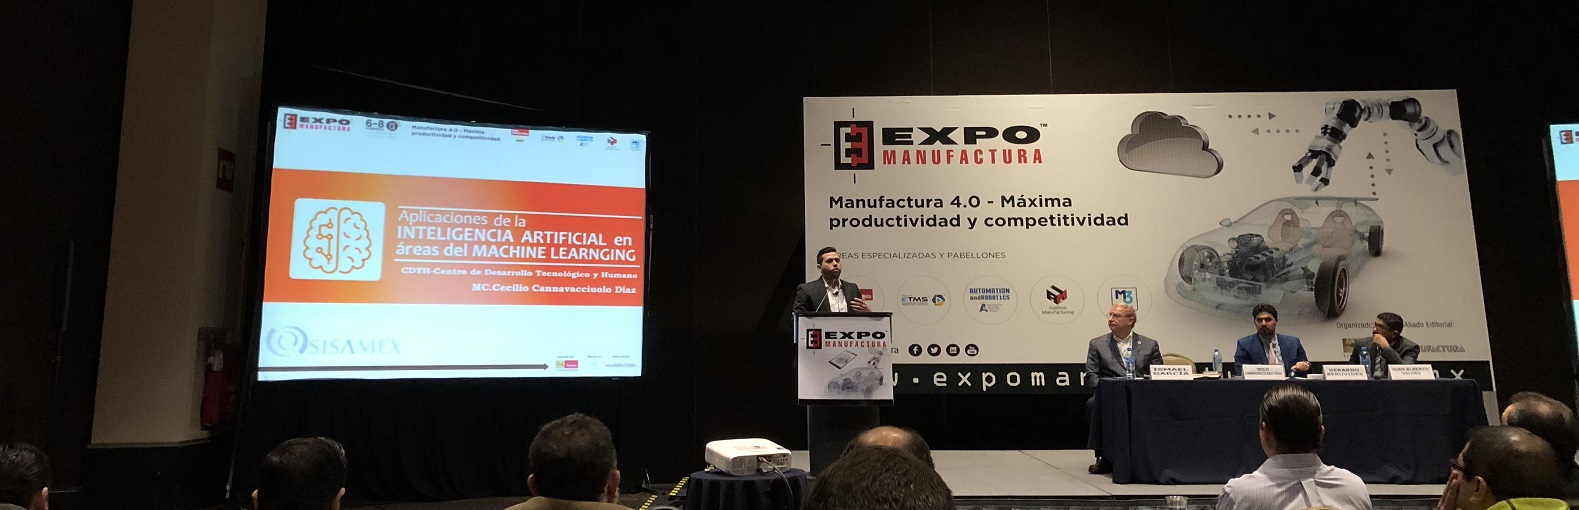 Expo Manufactura 2019